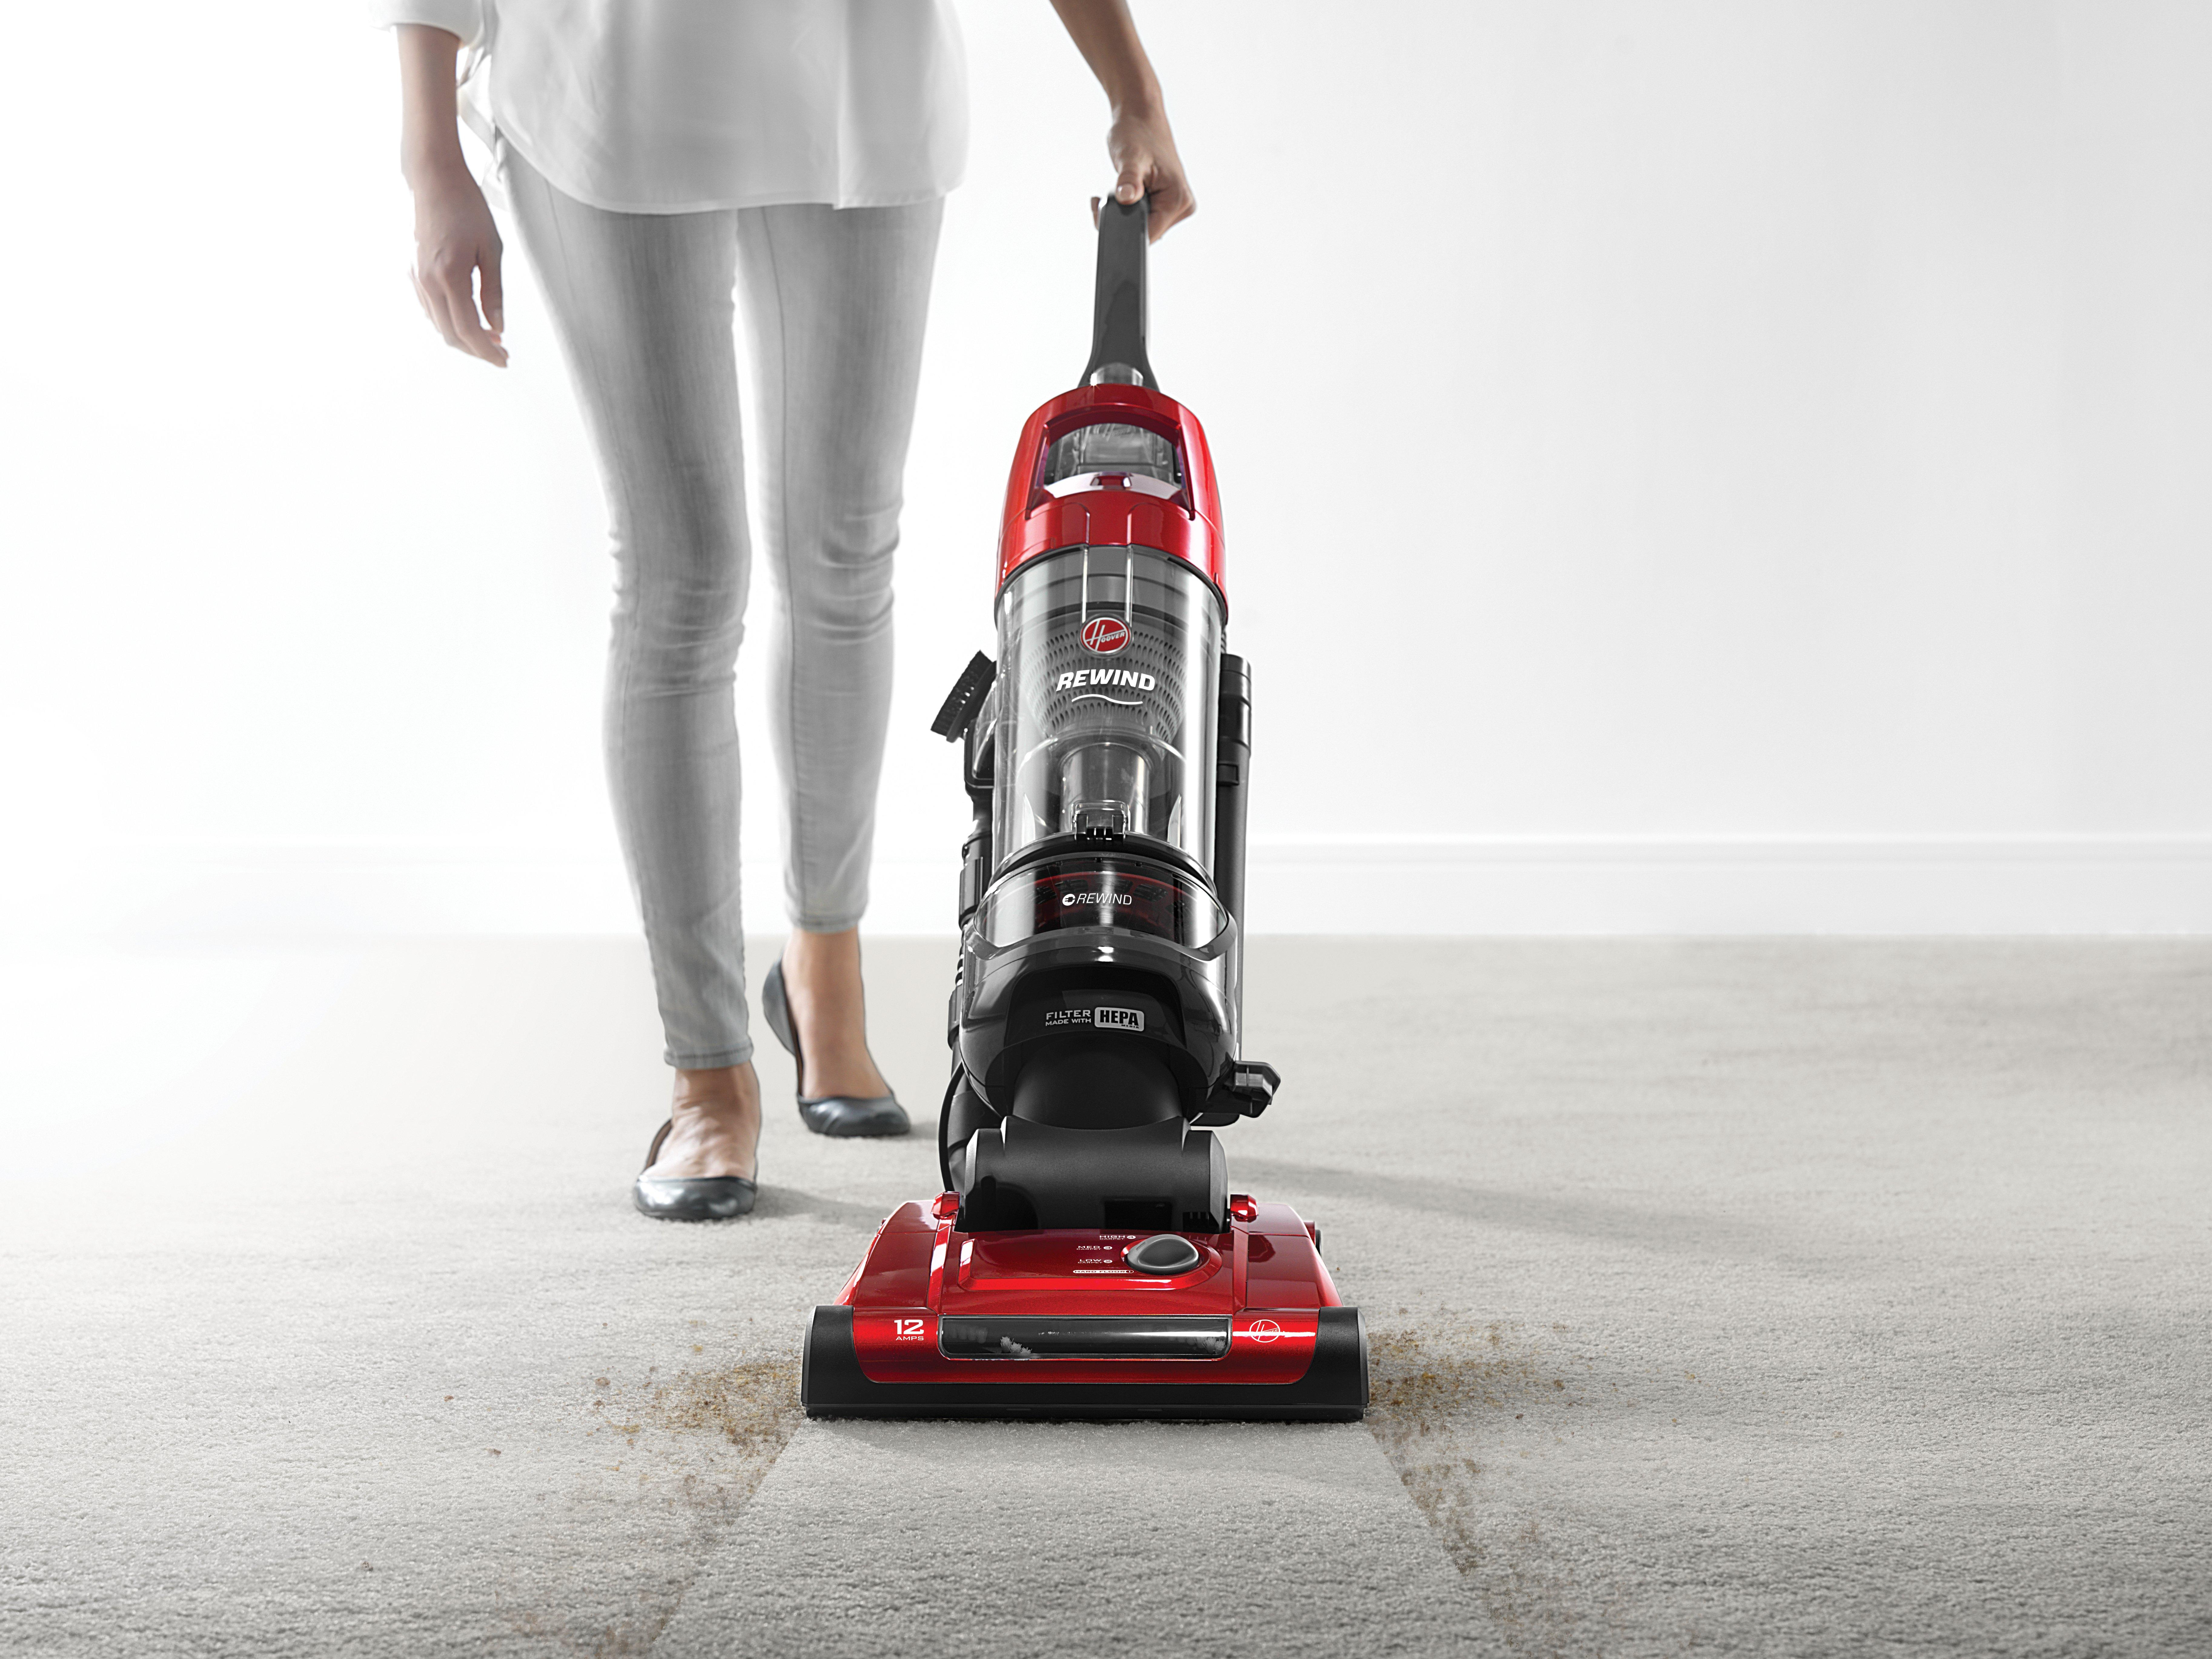 Hoover-Elite-Rewind-Upright-Vacuum-Cleaner-Damaged-Box-UH71012DM thumbnail 6